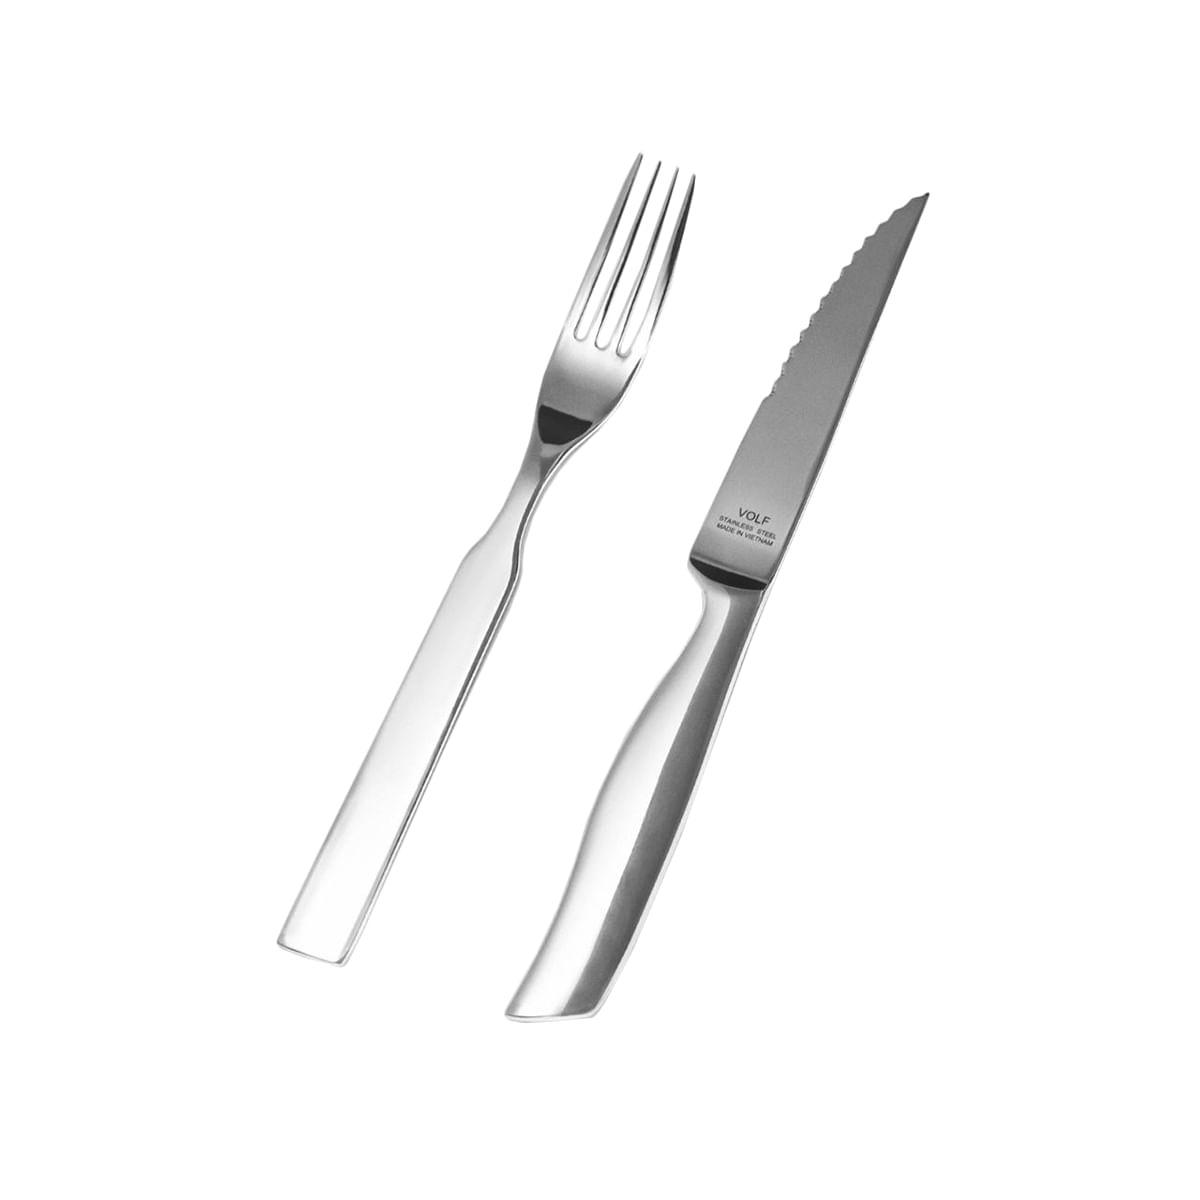 cuchillo-tenedor-acero-inoxidable